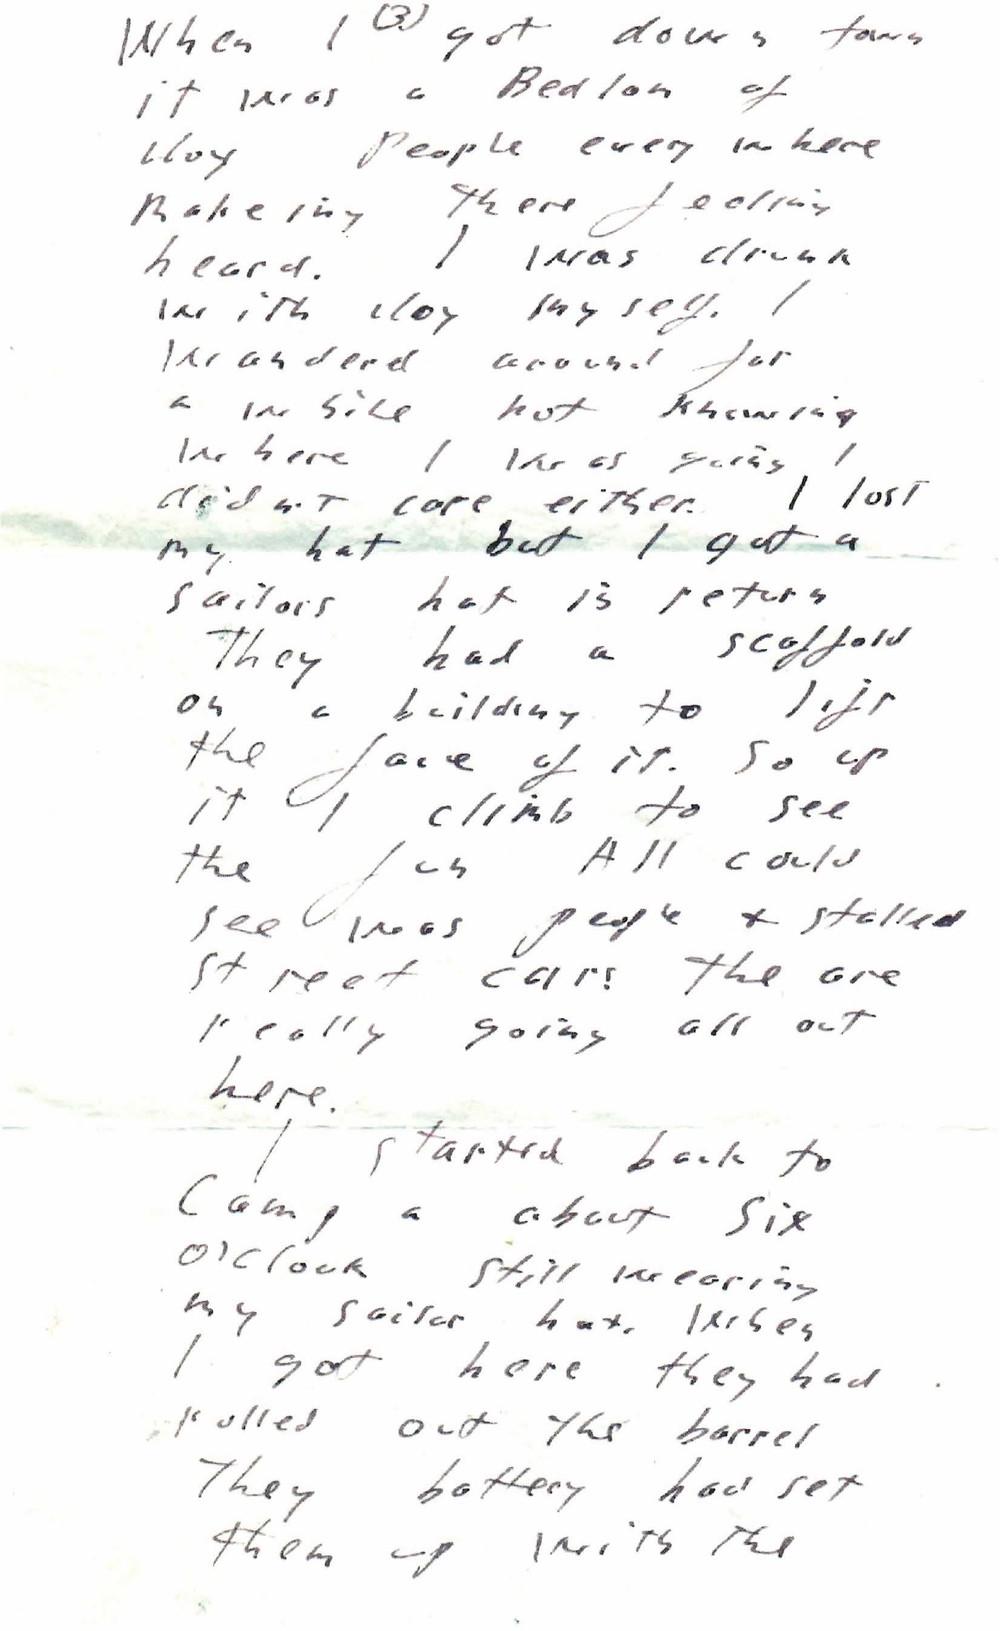 Daddy's letter VJ Day San Fransisco 004.jpg